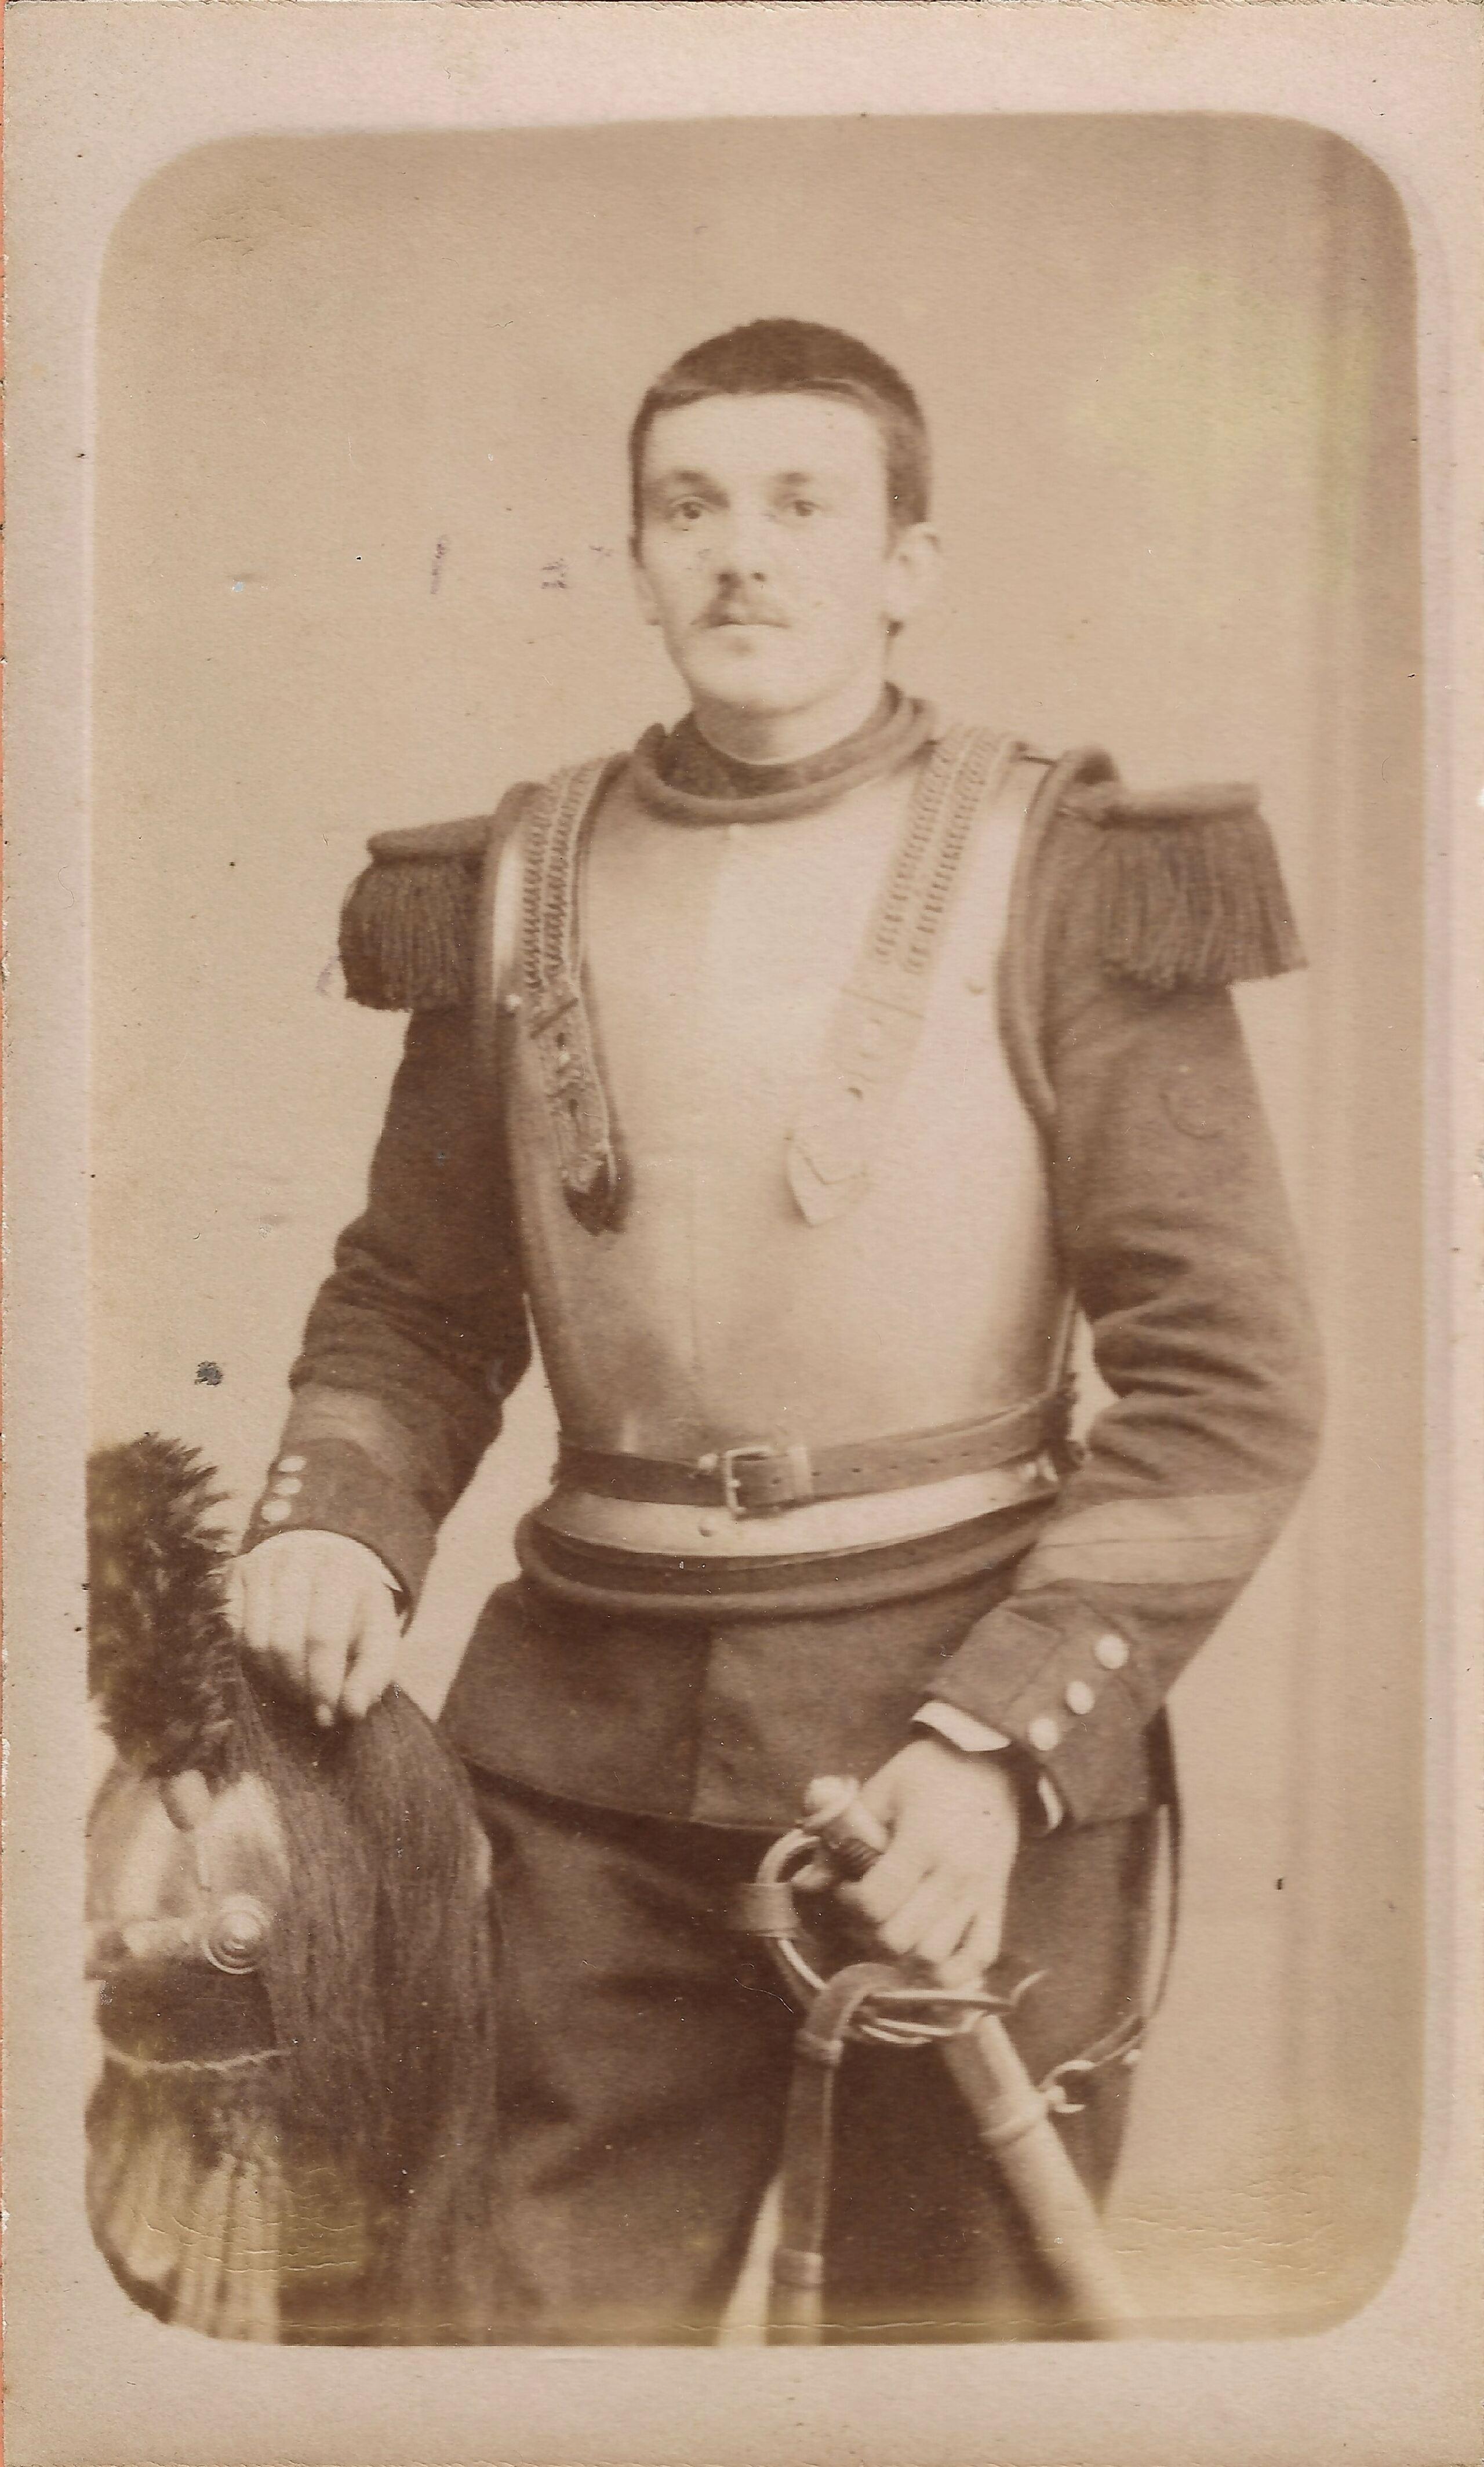 - Les Cuirassiers du Dauphin Cavalerie - Cdv_c107